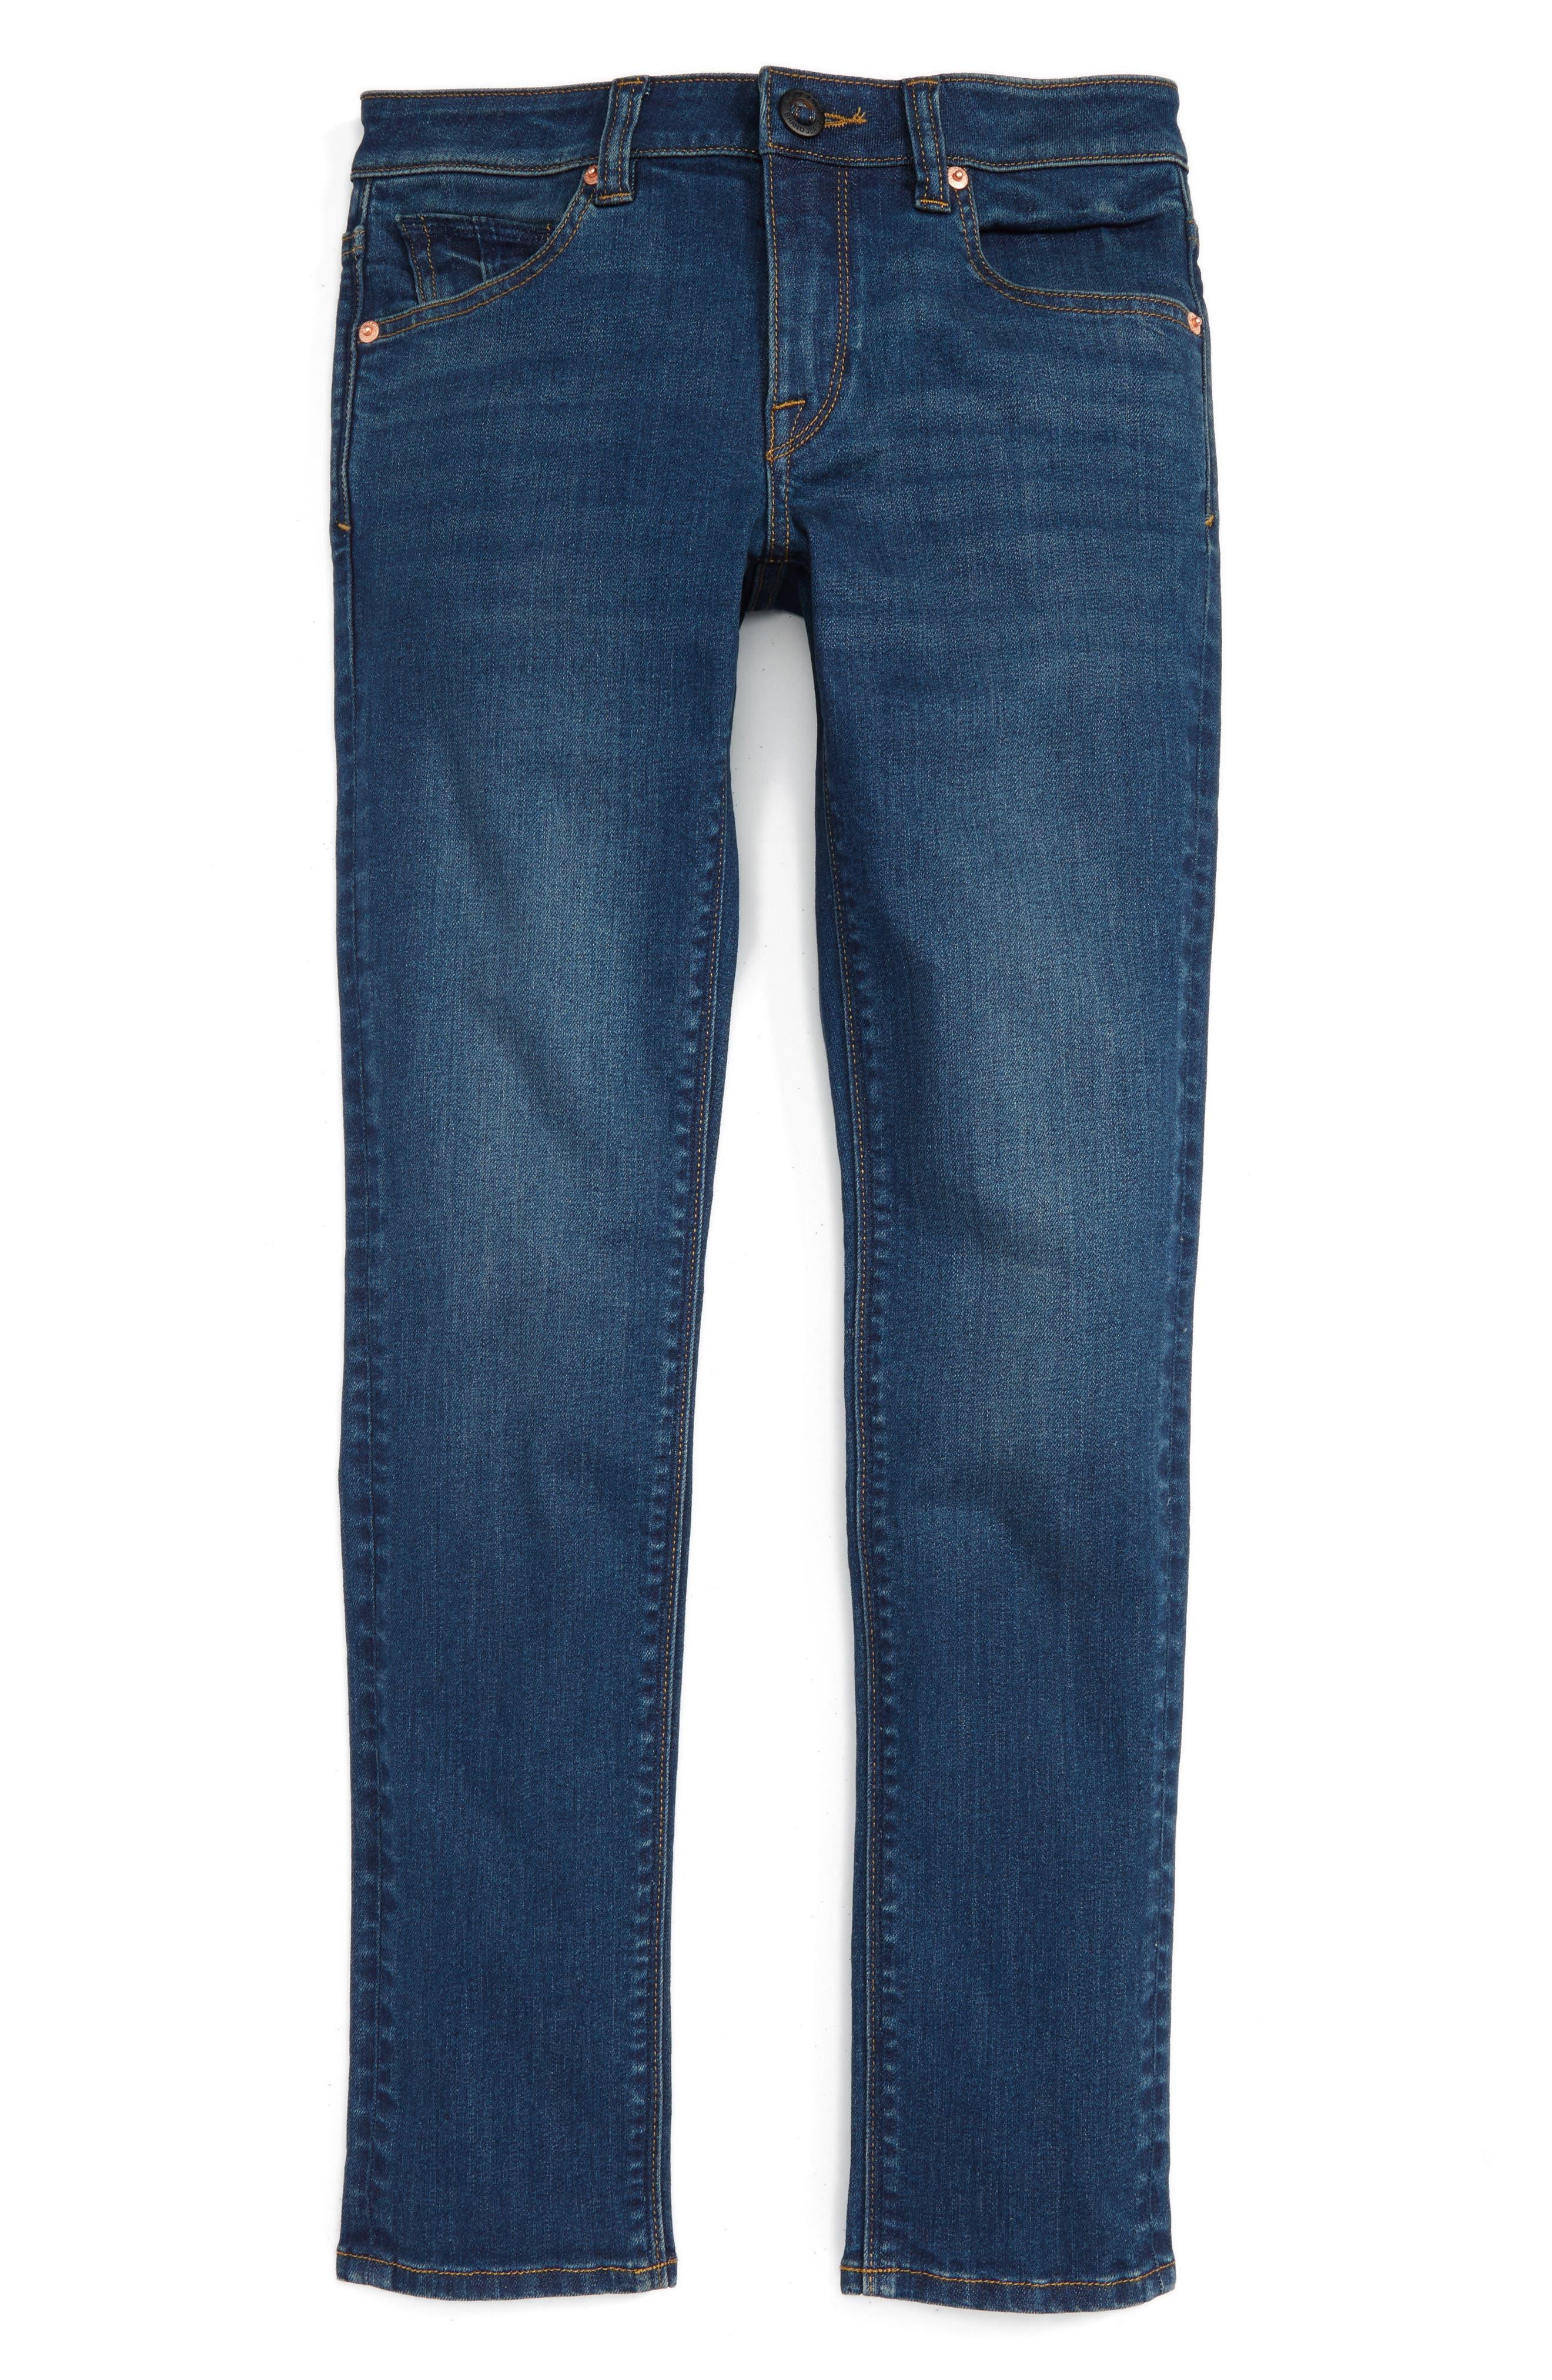 'Solver' Straight Leg Denim Jeans,                             Main thumbnail 4, color,